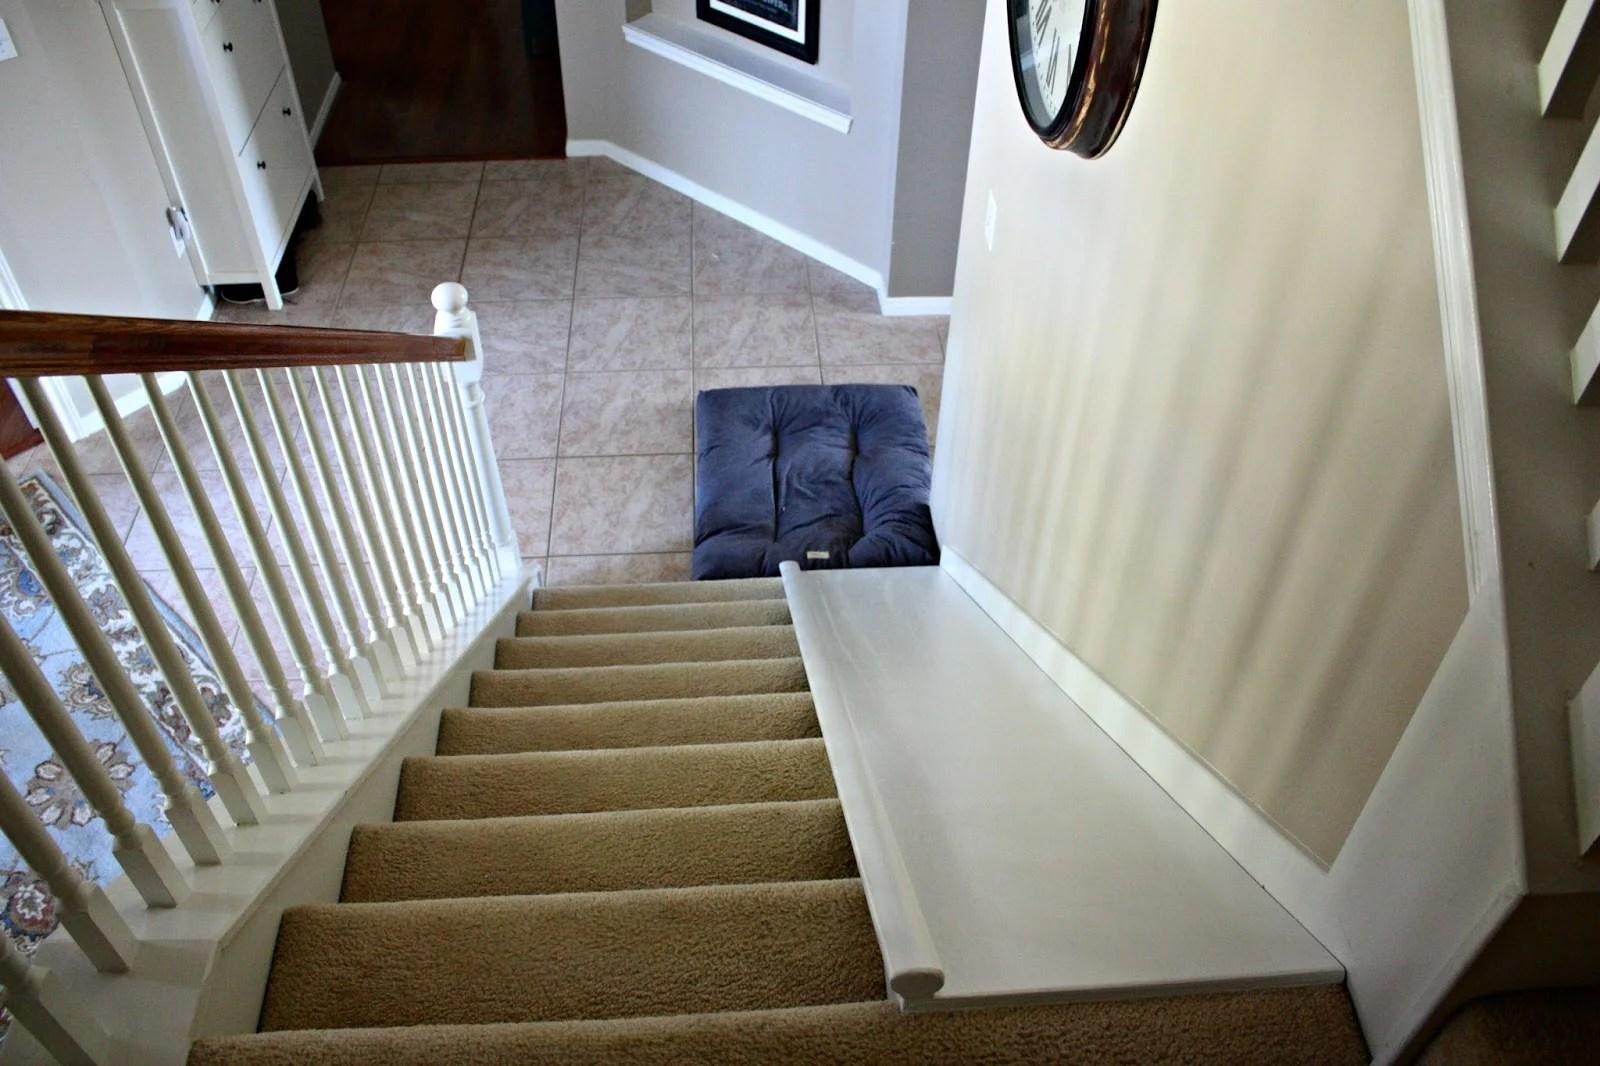 Beautiful DIY Indoor Stair Slide, With A Super Easy Tutorial, Plus The Slide Is Easy